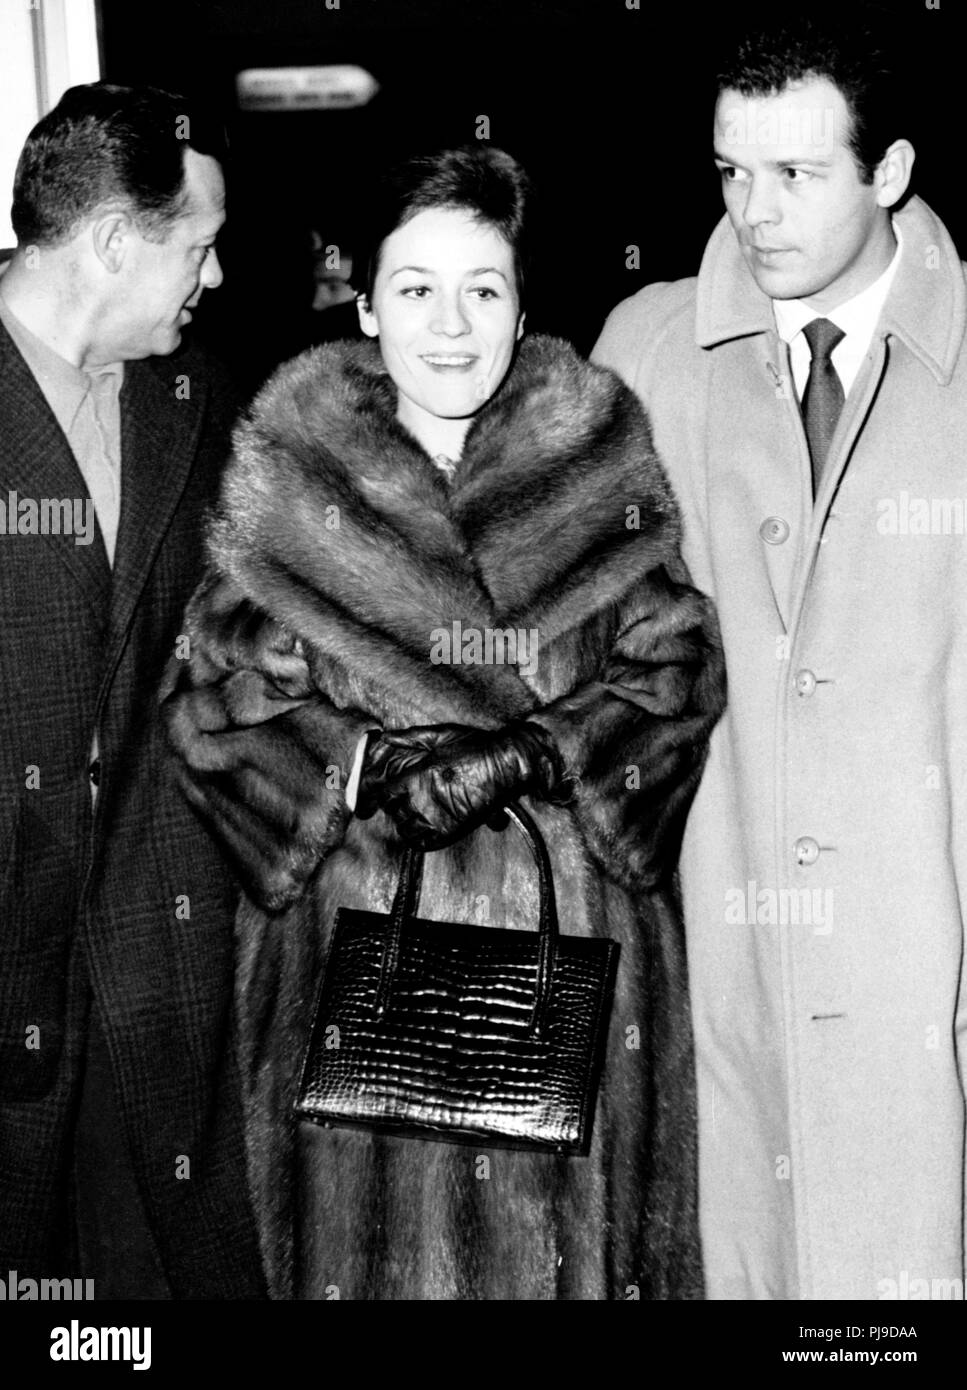 Annie Girardot, renato salvatori, 1962 Banque D'Images